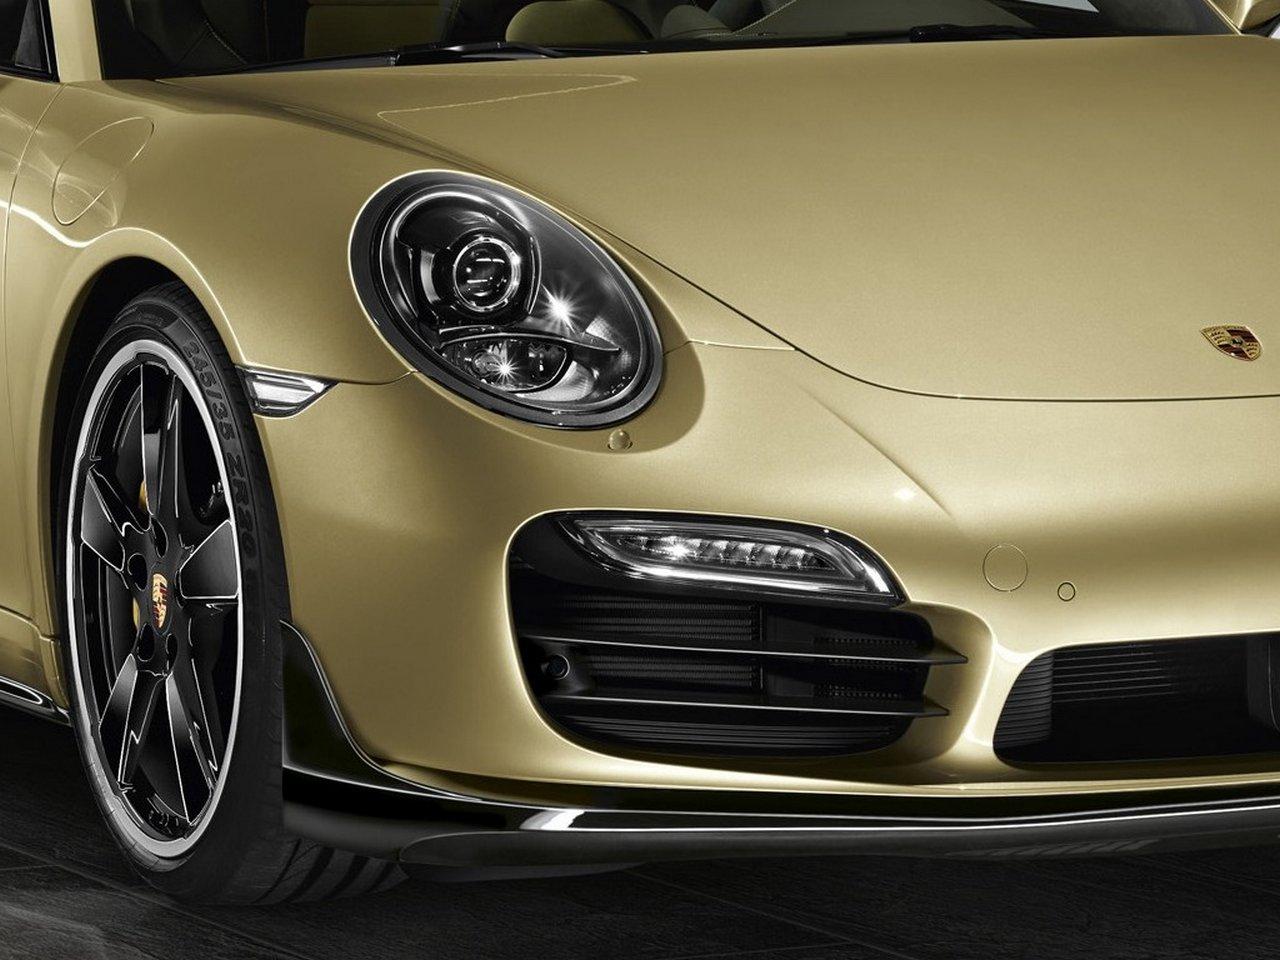 porsche-nuovo-aerokit-per-911-991-turbo-turbo-s_0-100_7